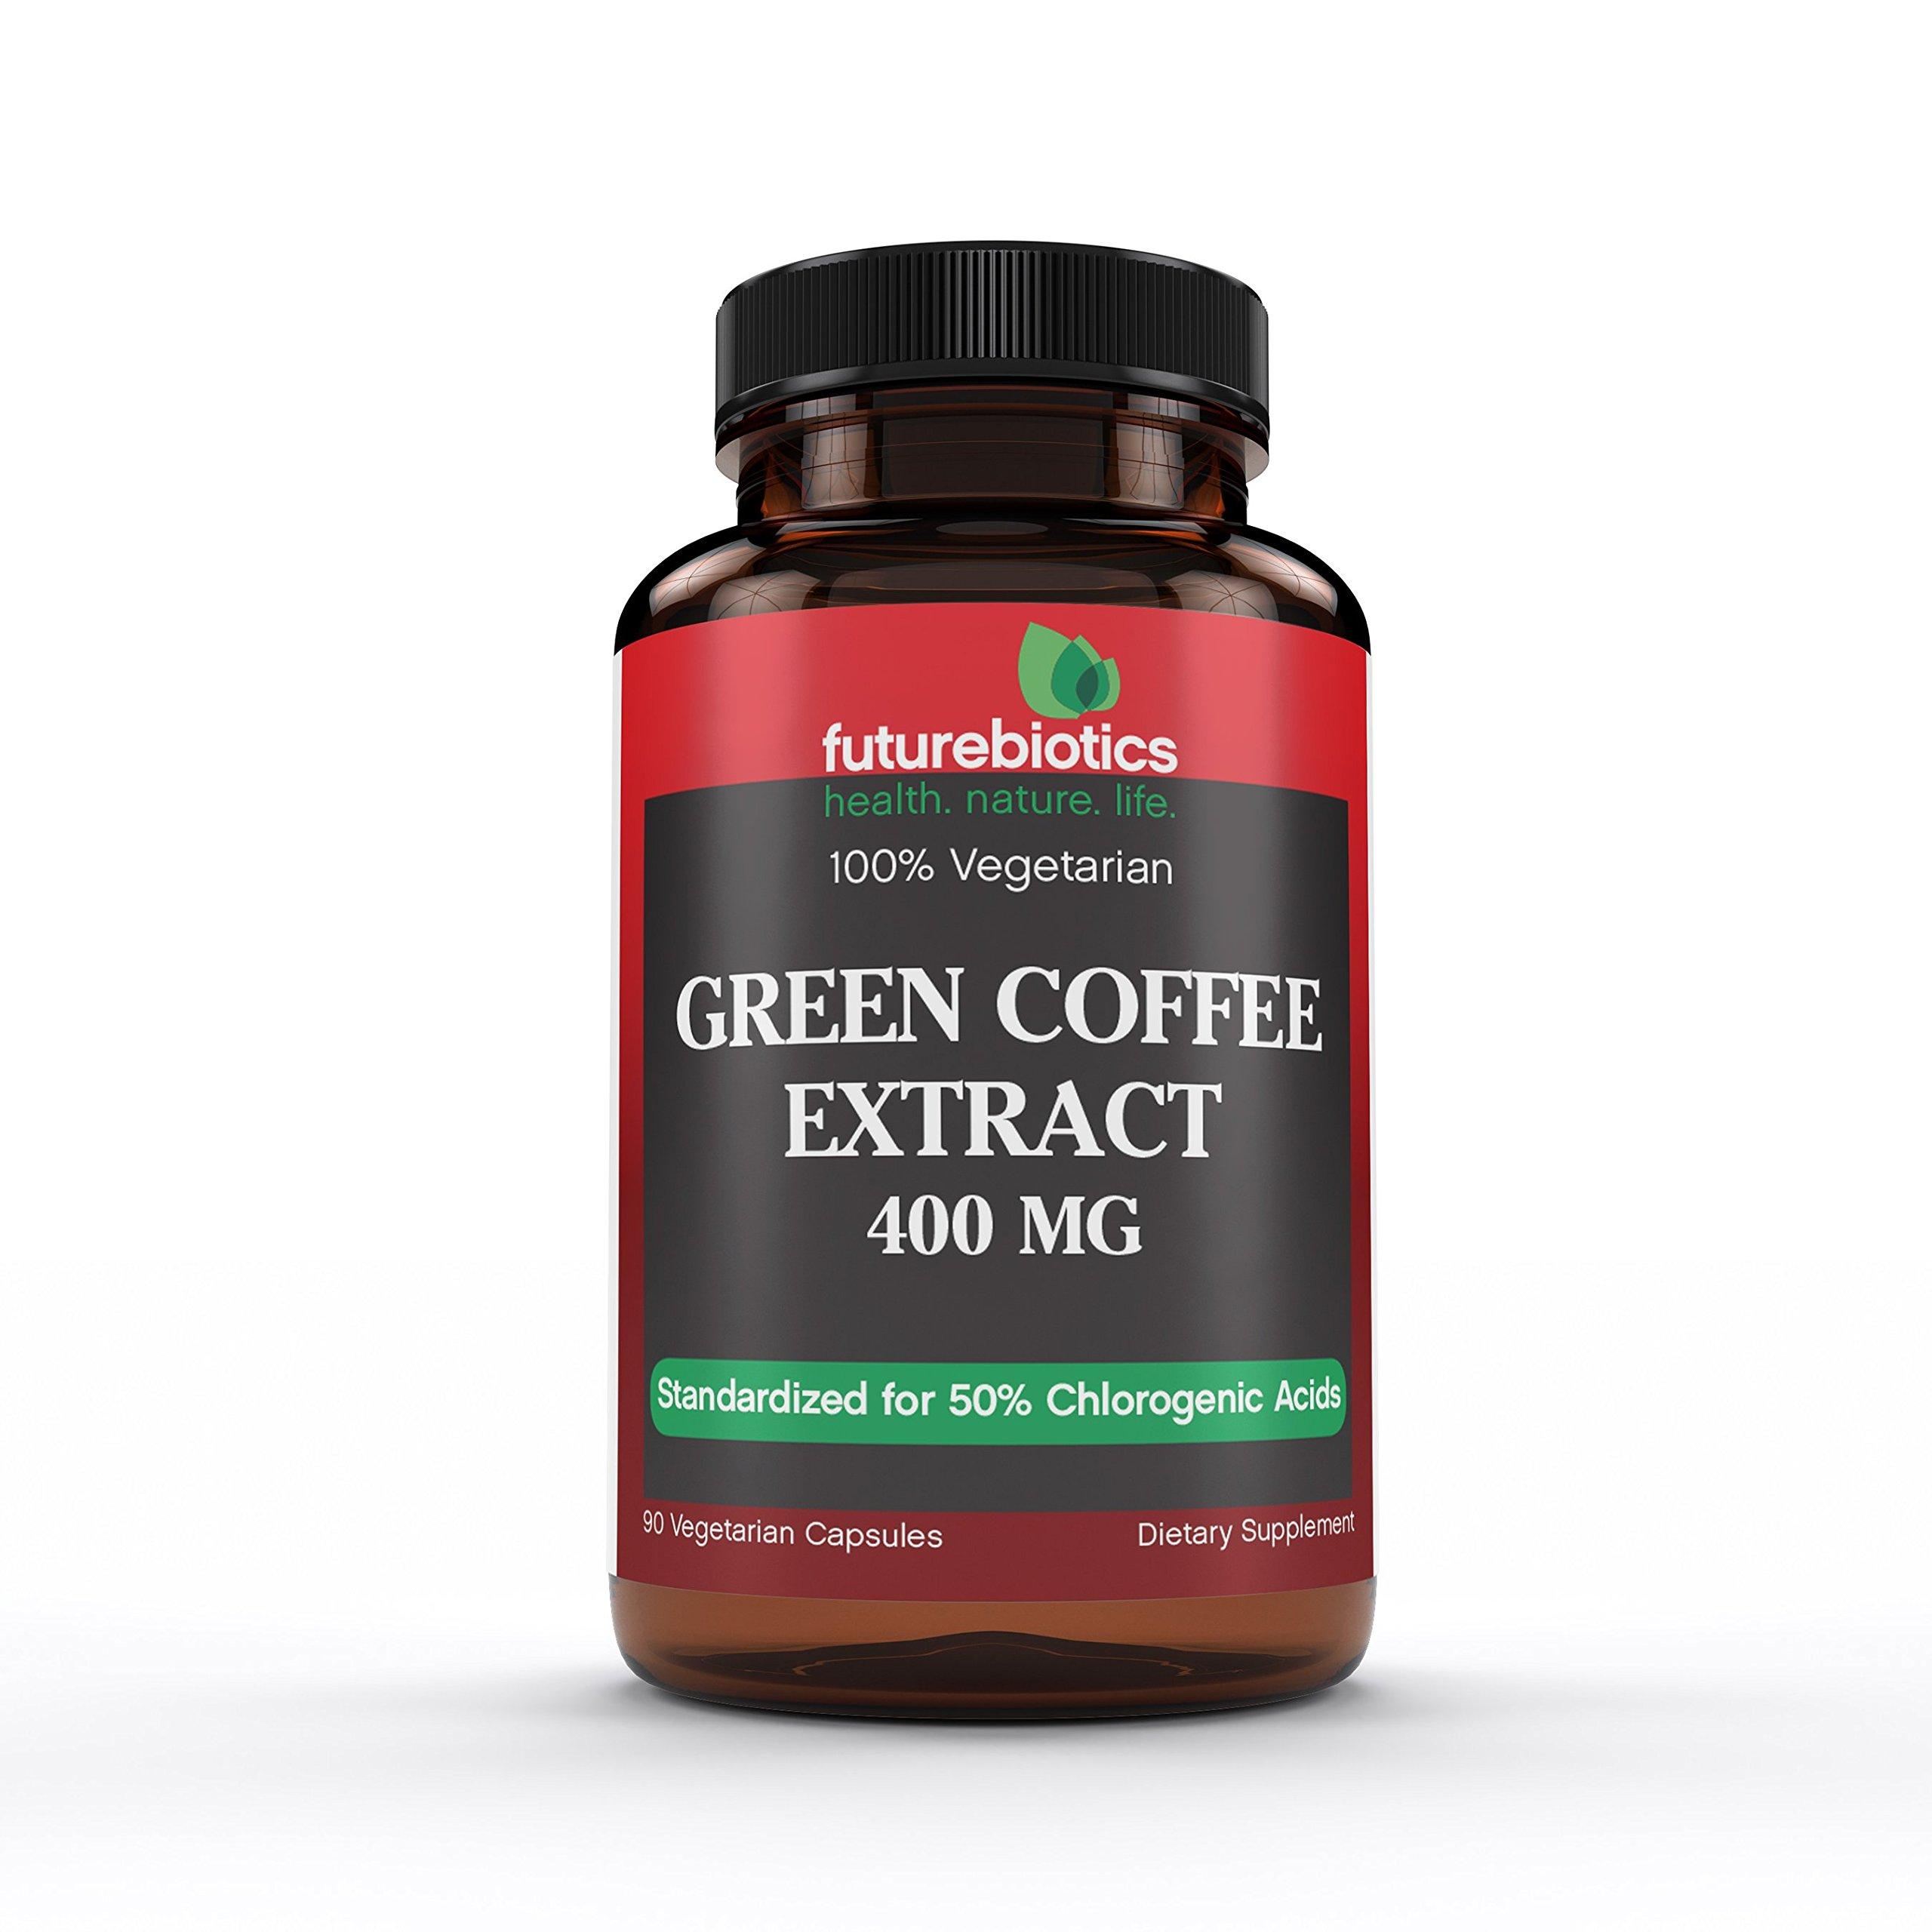 Futurebiotics Green Coffee Extract 400mg, 90 Vegetarian Capsules